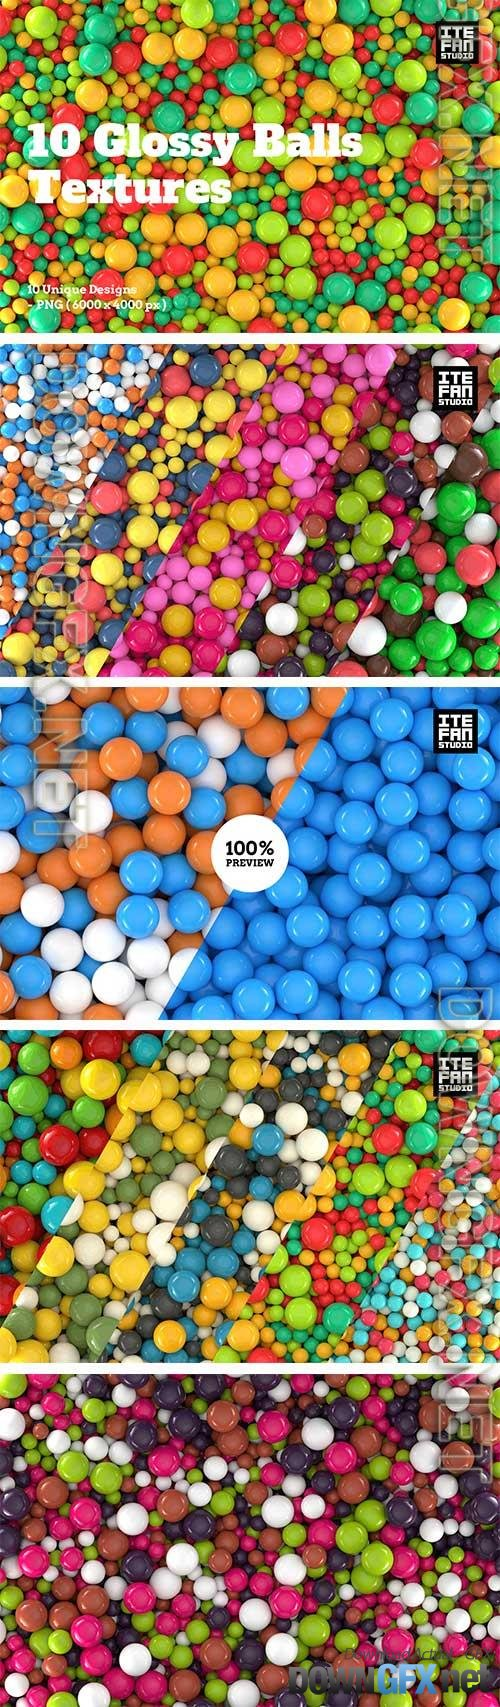 10 Glossy Balls Textures